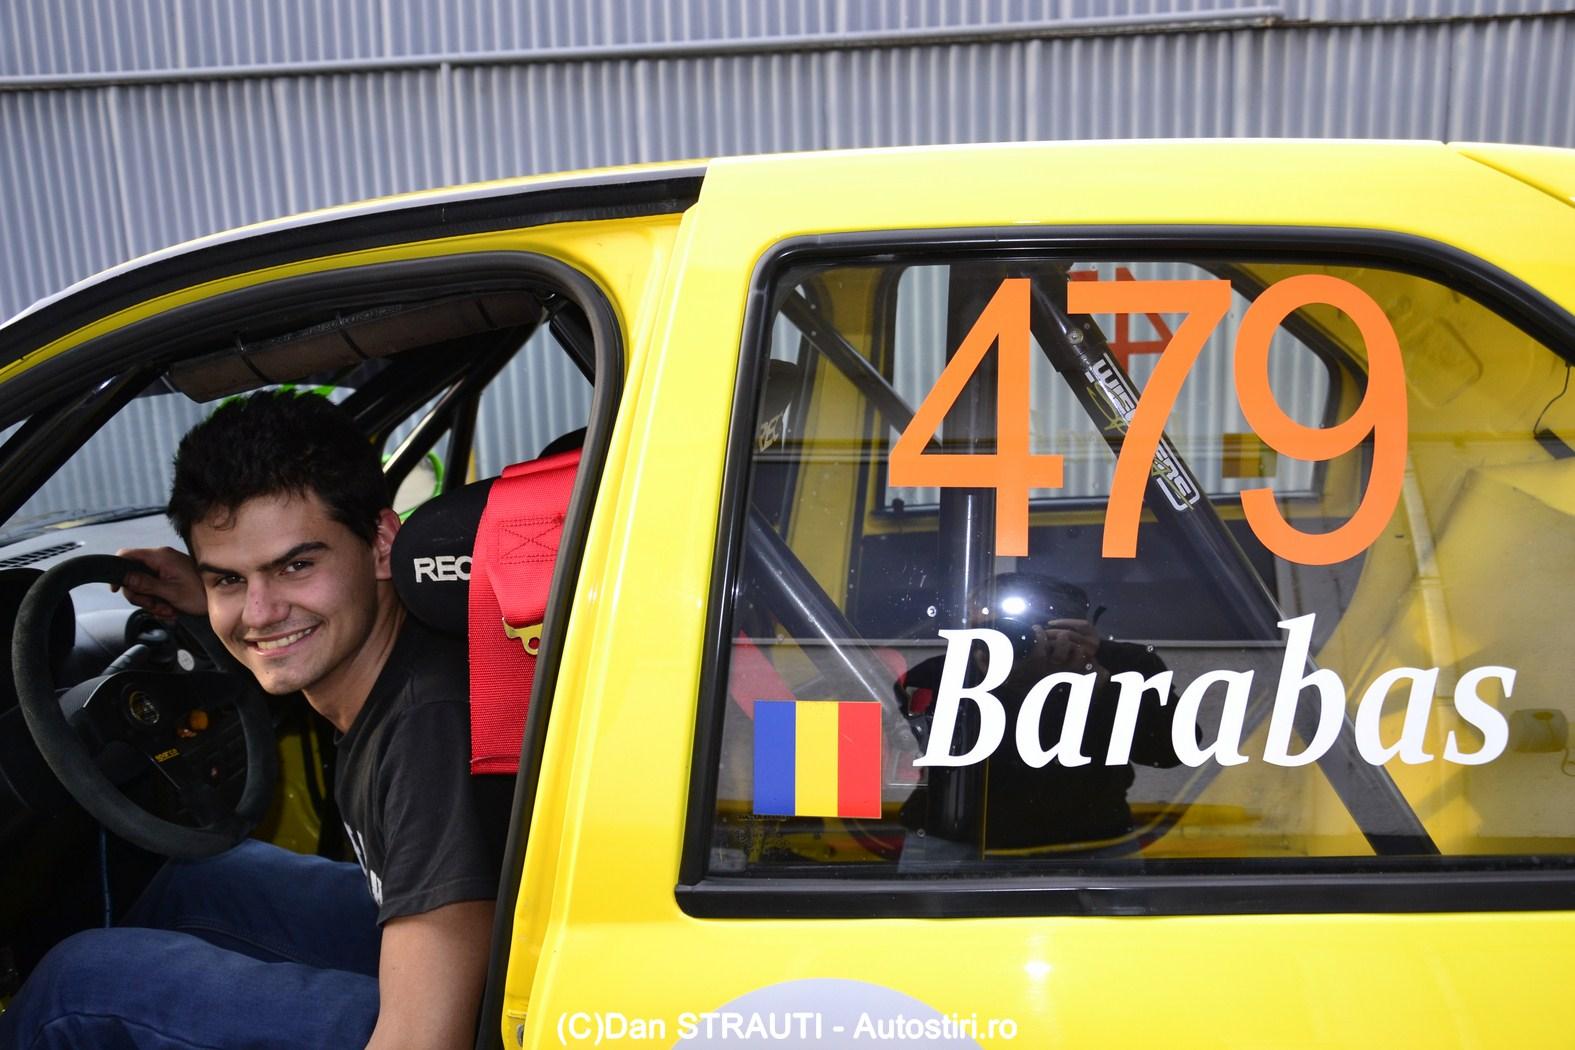 Barabas Robert, de pe pista de karting in competitiile de viteza in coasta